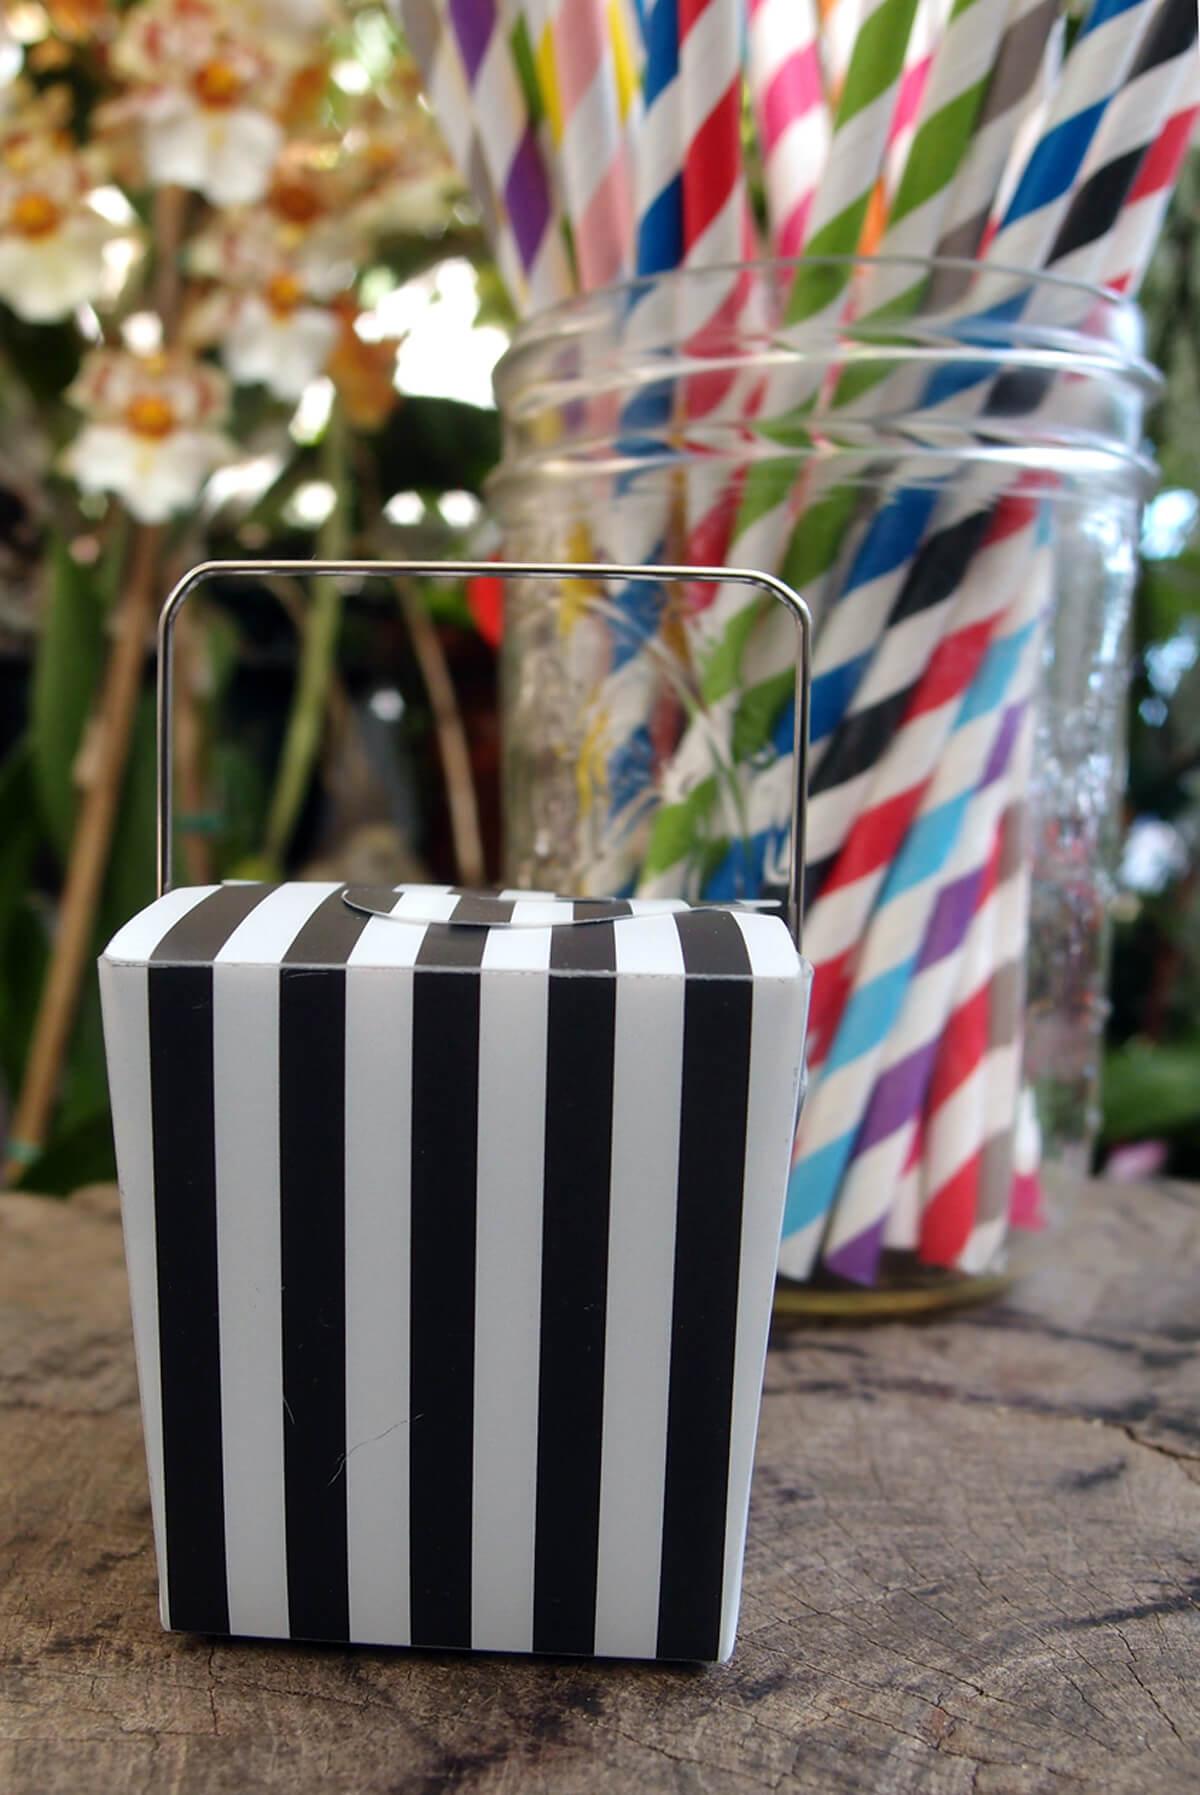 12 Mini Black Amp White Striped Takeout Boxes 2 Quot 12 Boxes